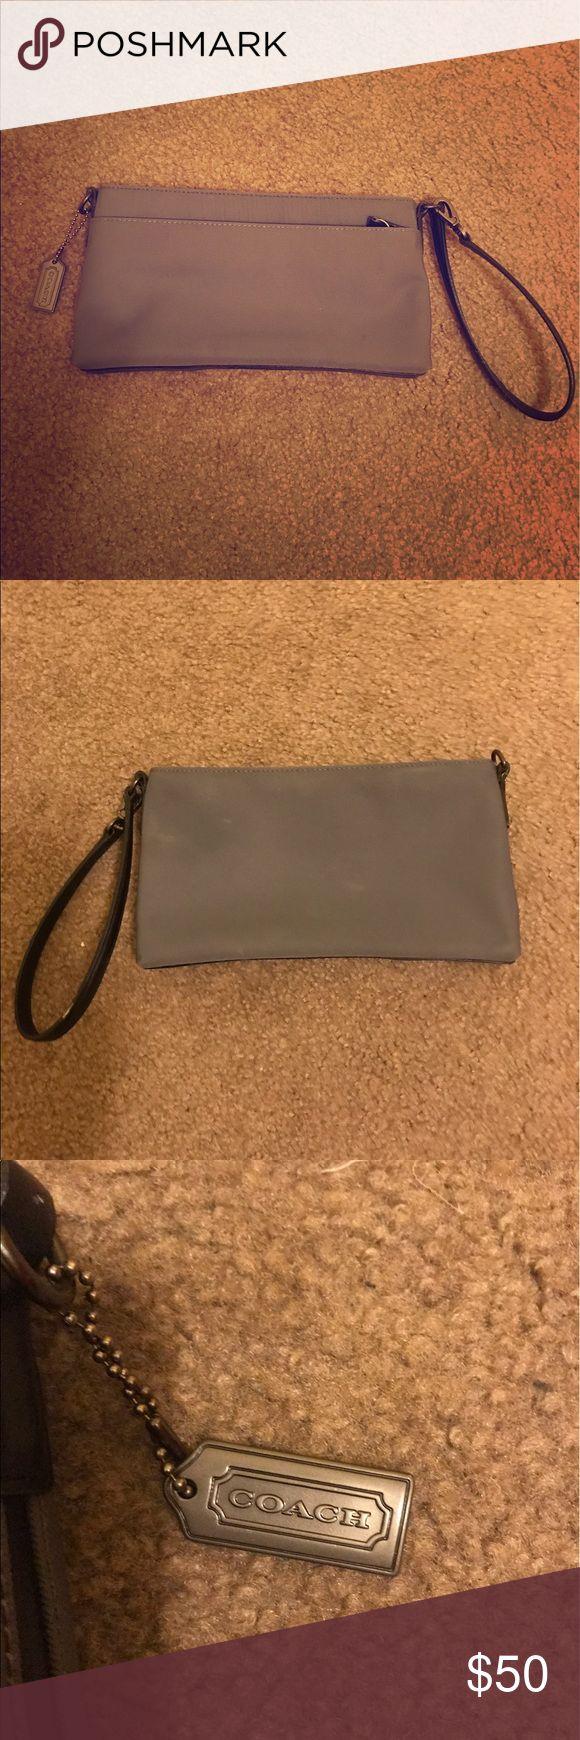 "COACH Mercer Demi Pochette Bag Gently used. Grey twill w/ black leather trim. Dark silver hardware. Zip top closure. 1 exterior zip pocket. Shoulder bag that converts to wristlet. 9.5""Lx5""Hx1.25""D. Coach Bags Clutches & Wristlets"